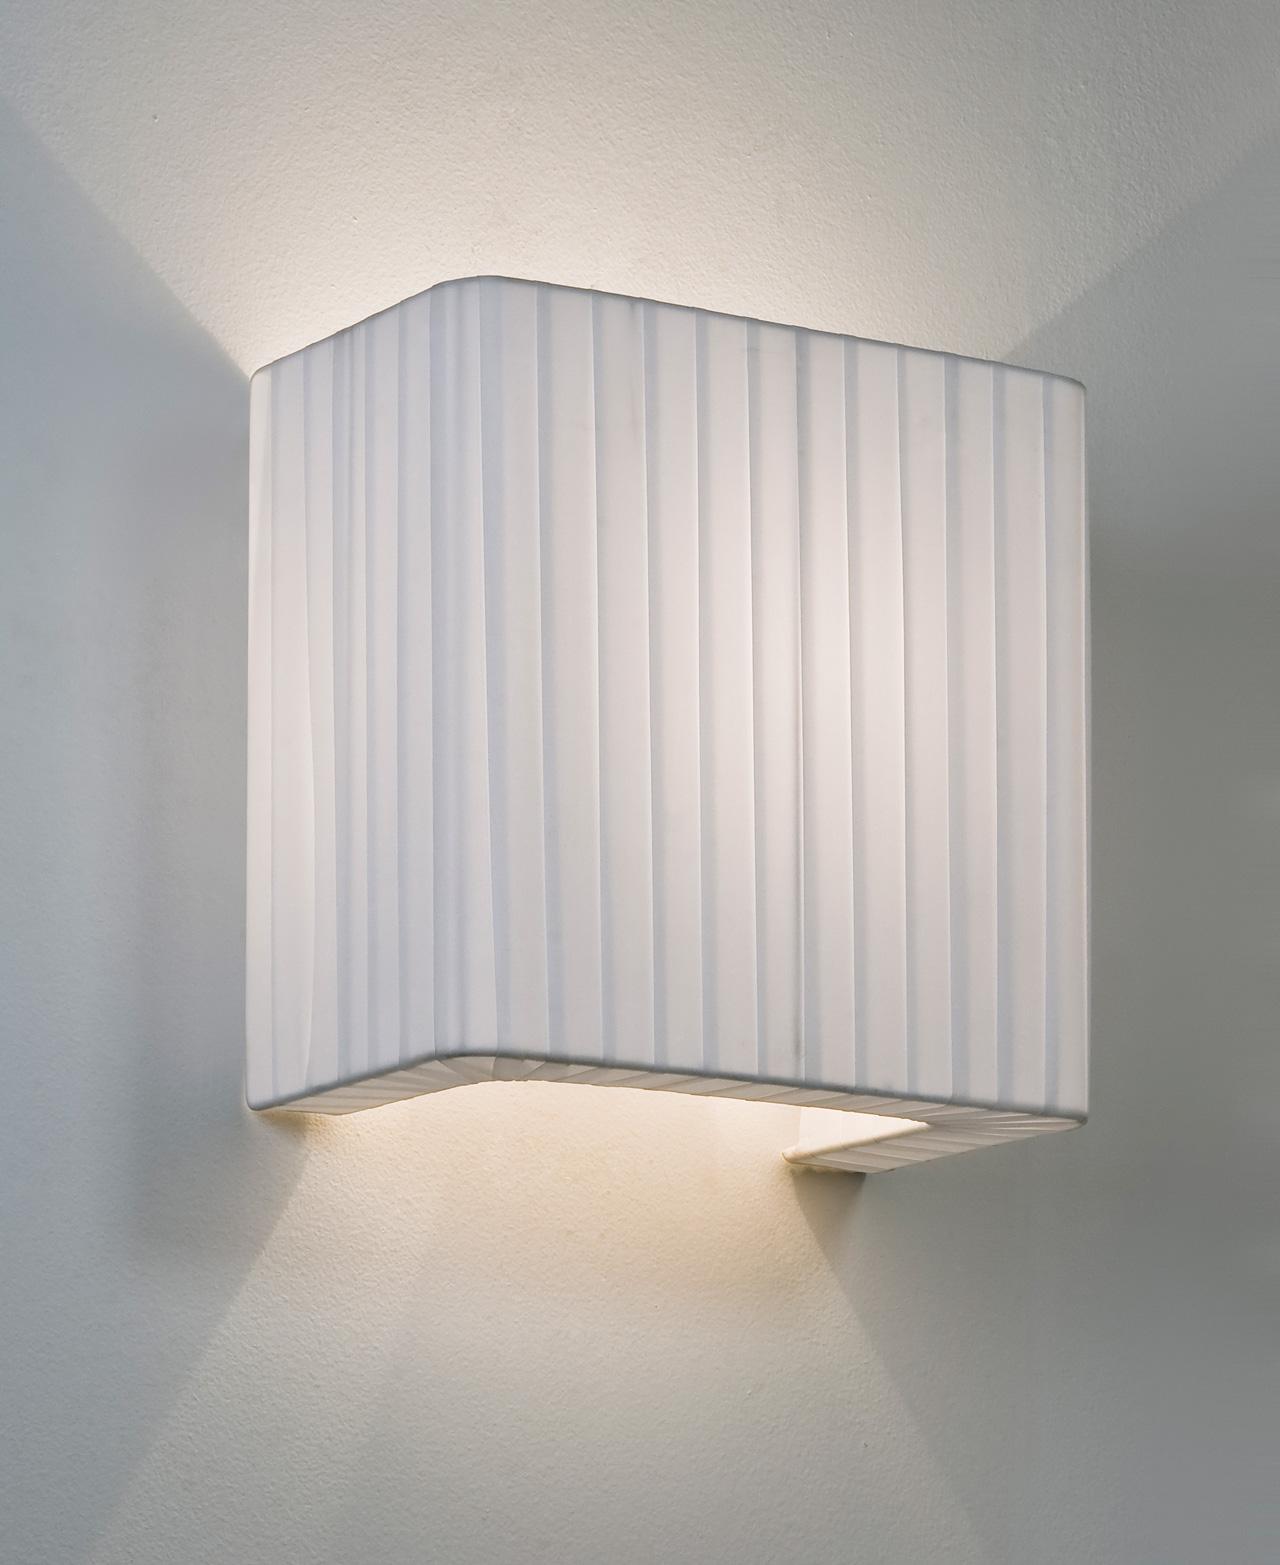 Astro peruga 250 fabric wall light shade 60w e27 white liminaires astro peruga 250 fabric wall light shade 60w e27 white aloadofball Gallery